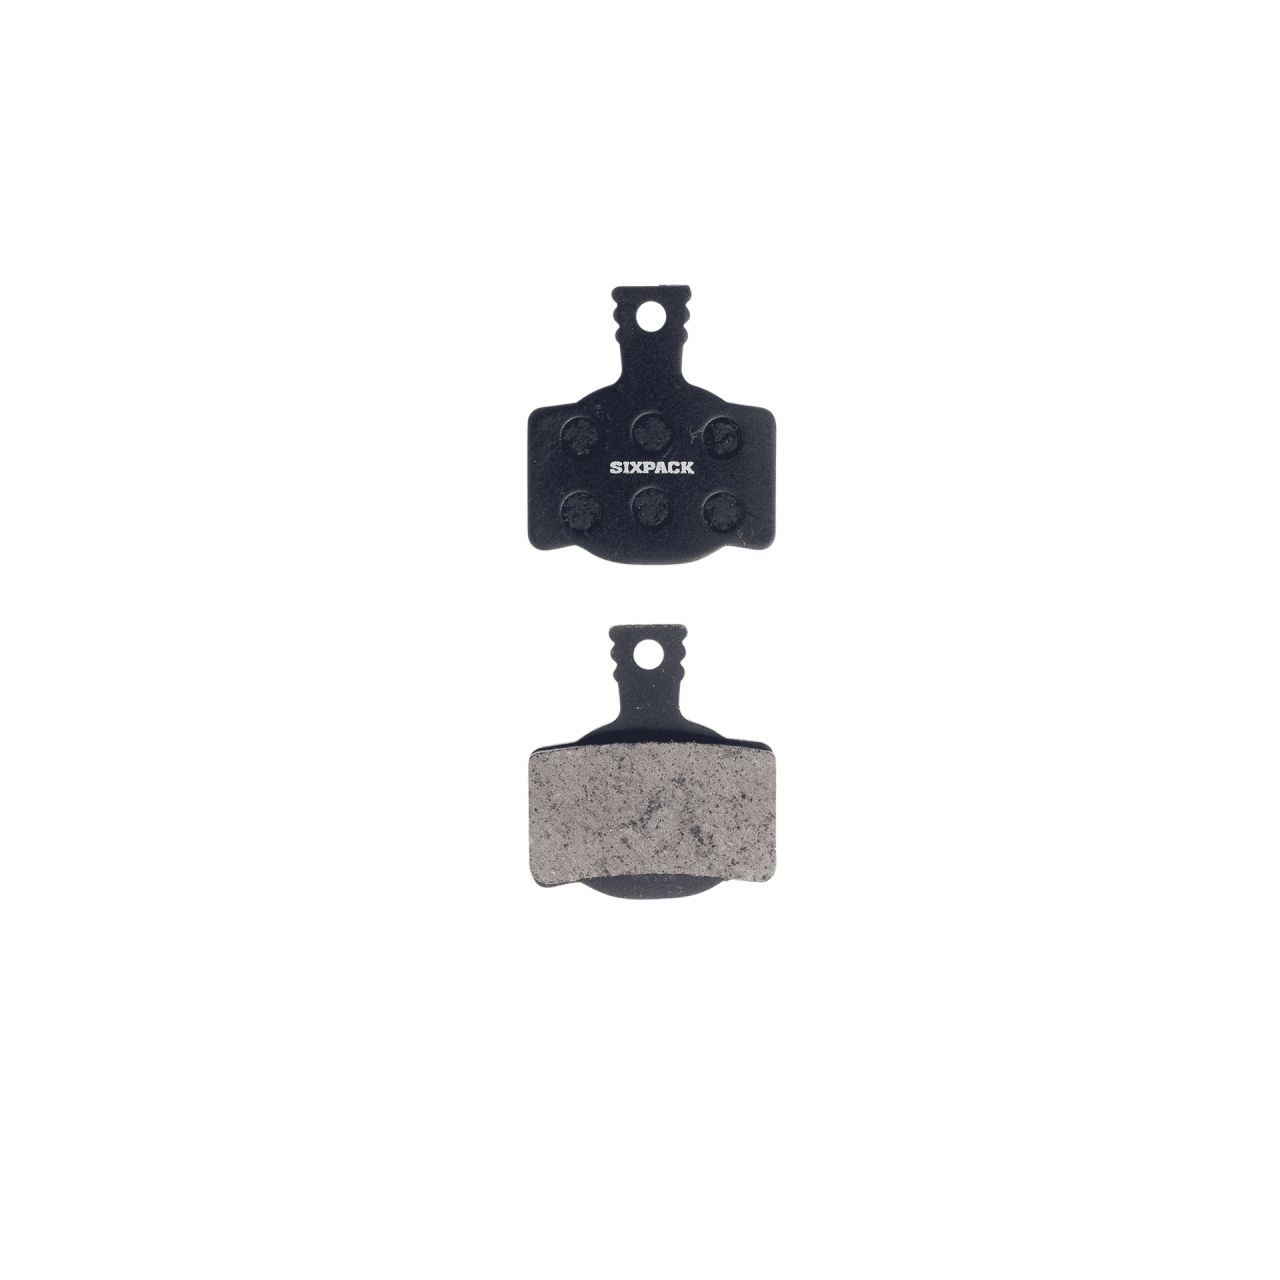 Semi-Metallic Brake Pads